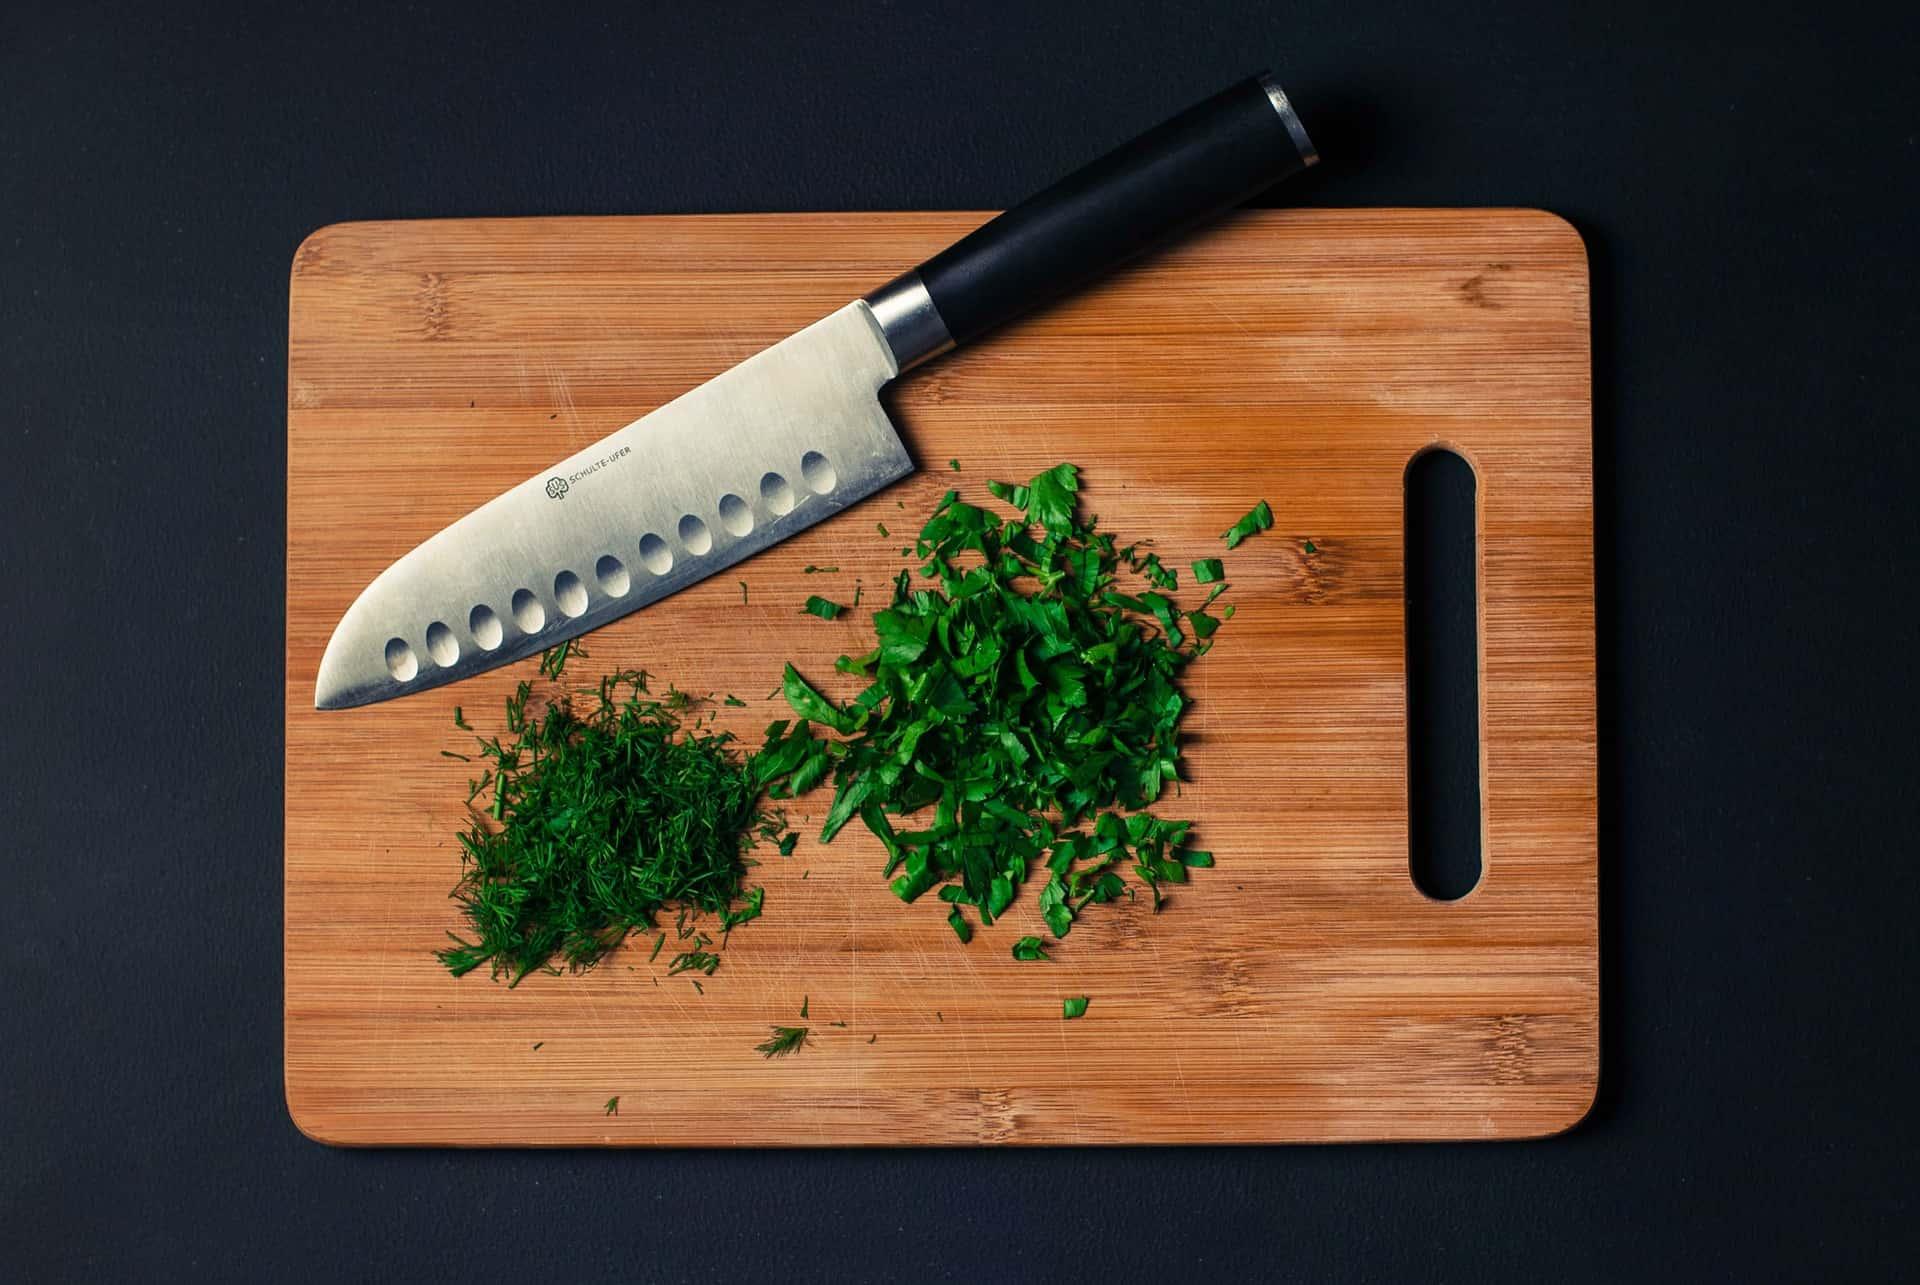 Tábua de madeira, com faca santoku, salsa e endro picados.